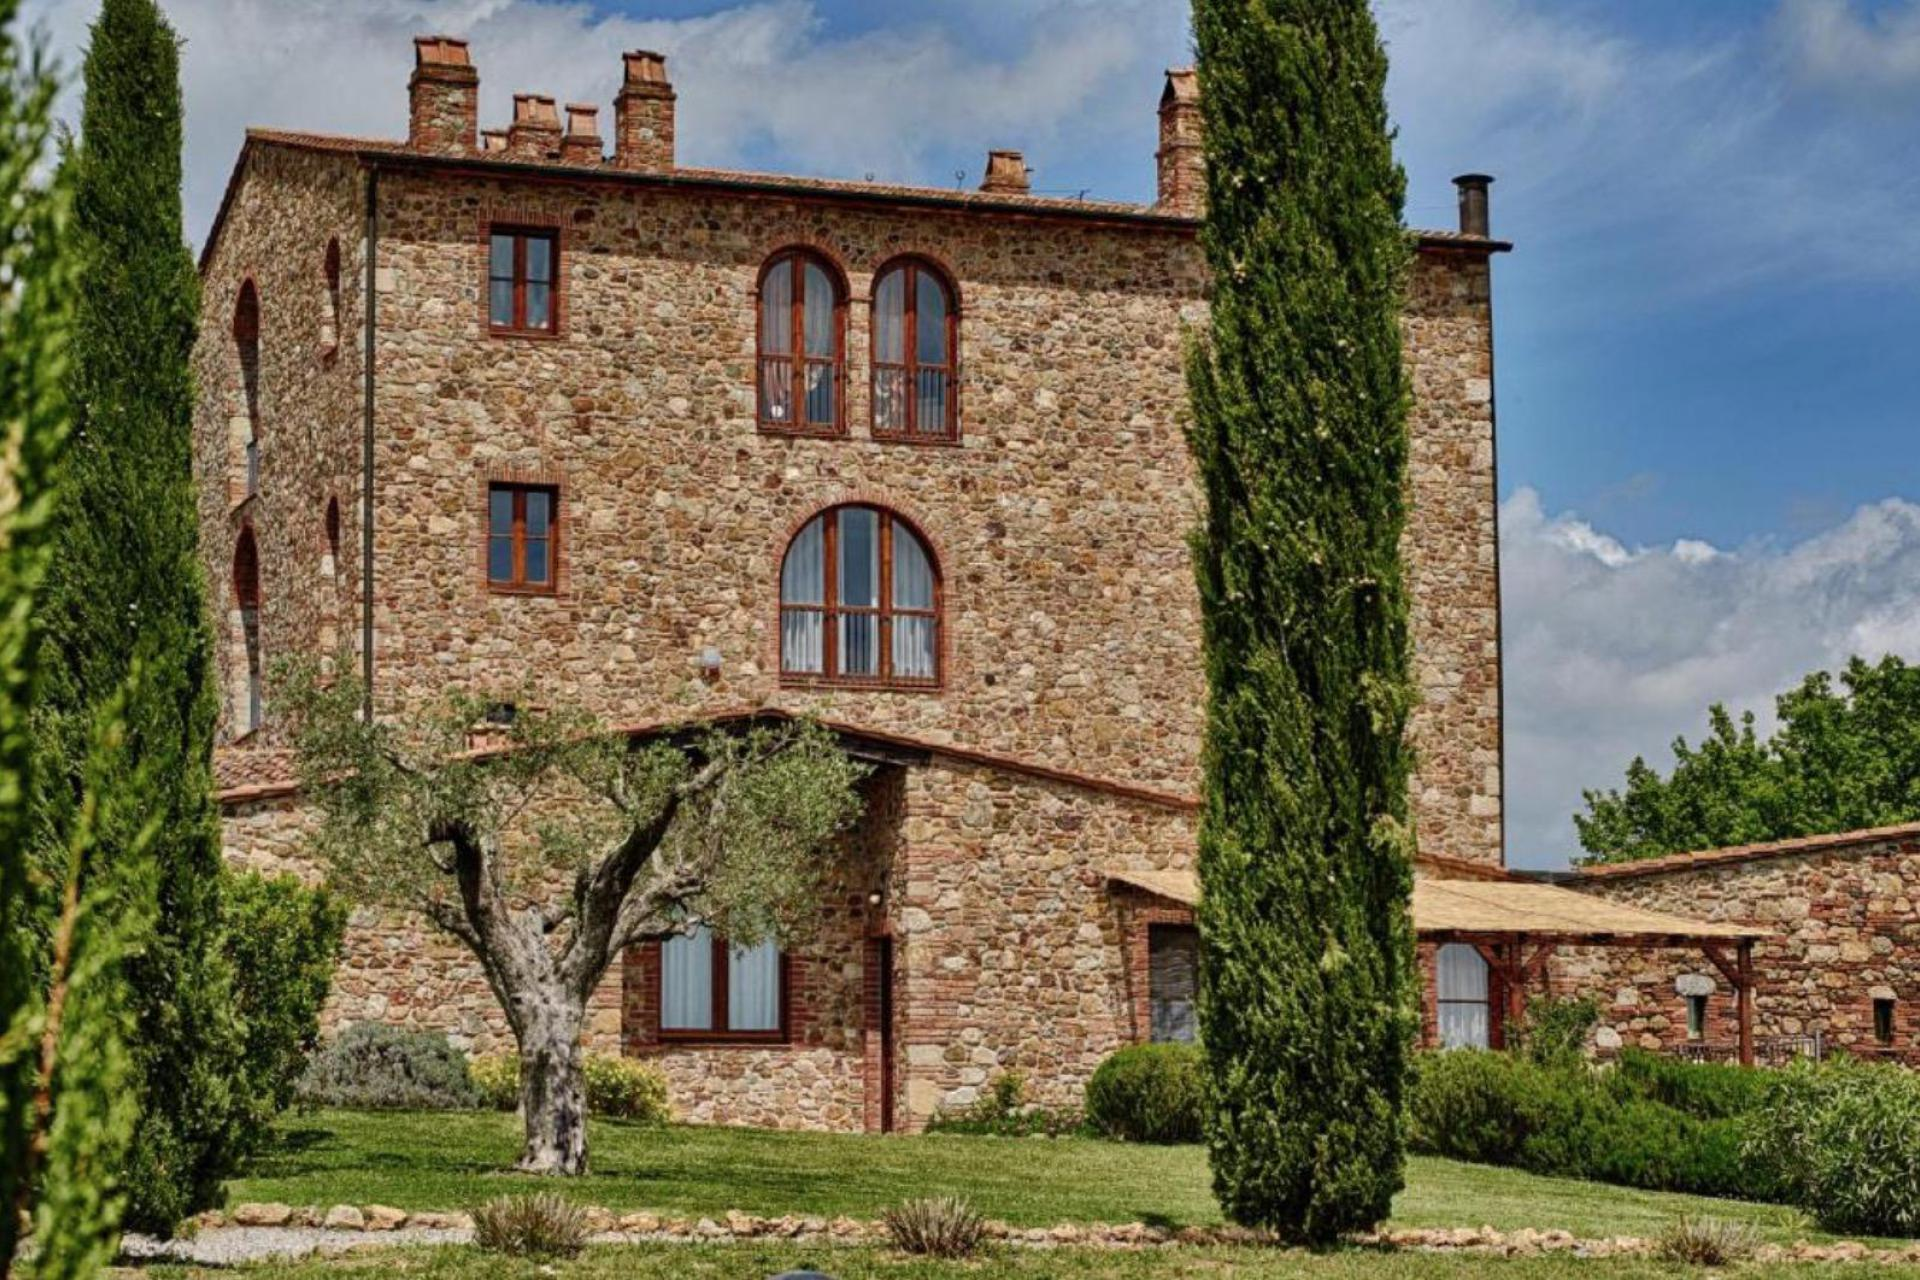 Agriturismo Toskana Ehemaliges Kloster in der Südtoskana   myitalyselection.de